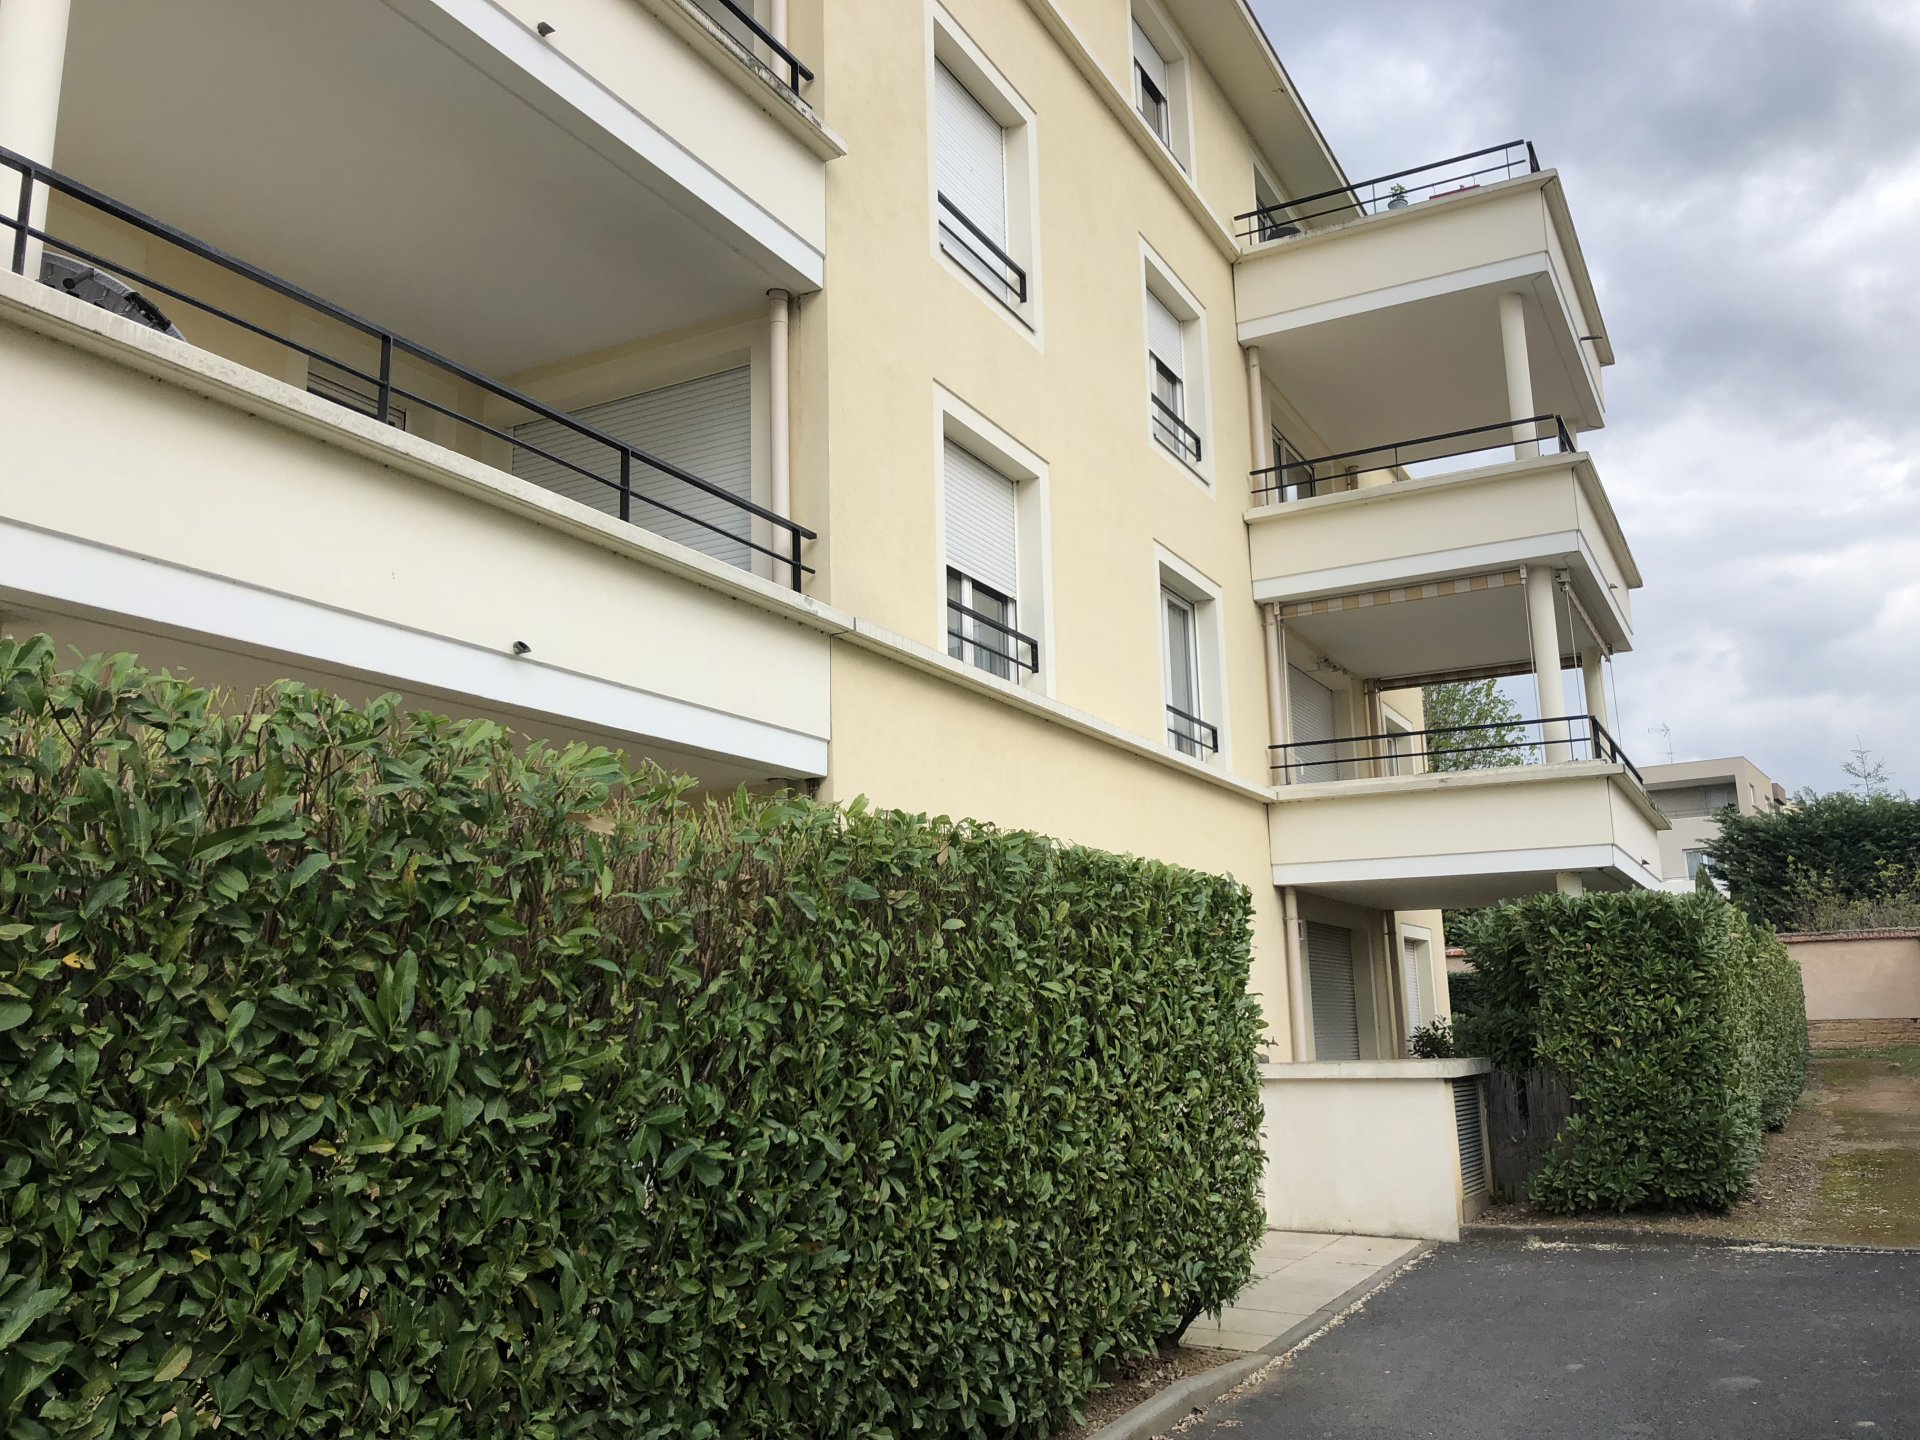 T3 avec balcon + garage